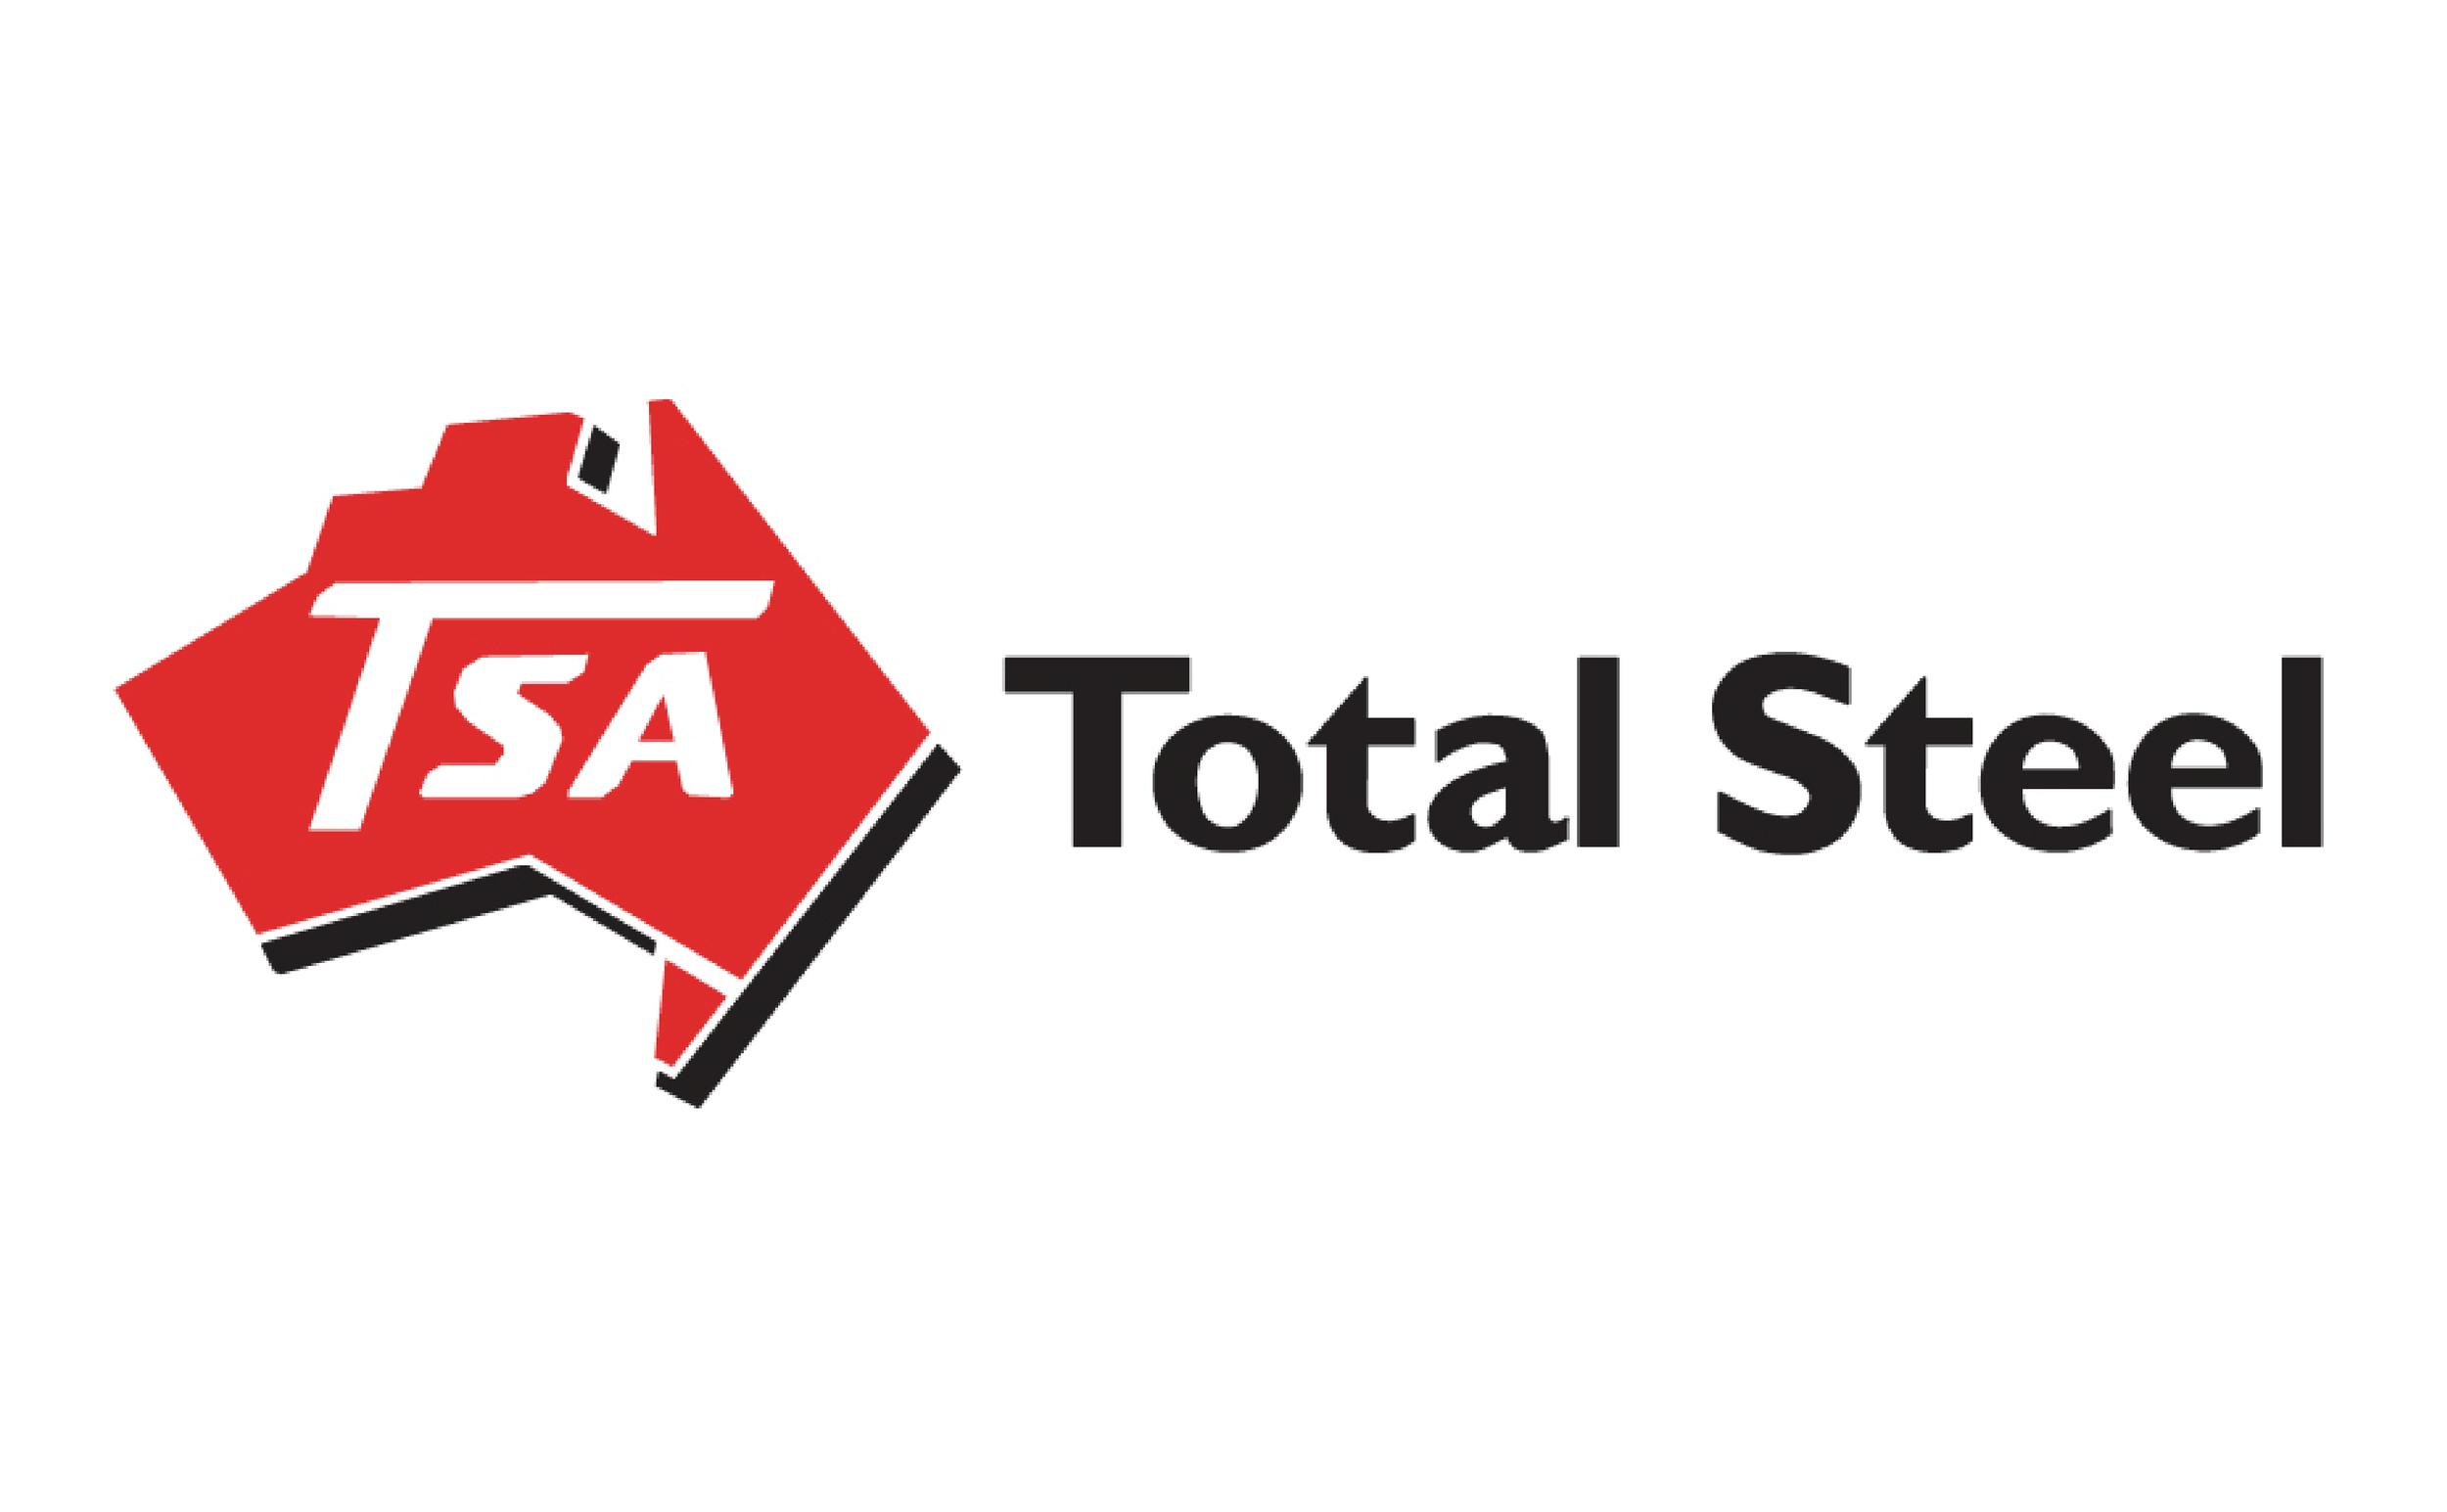 Total Steel of Australia